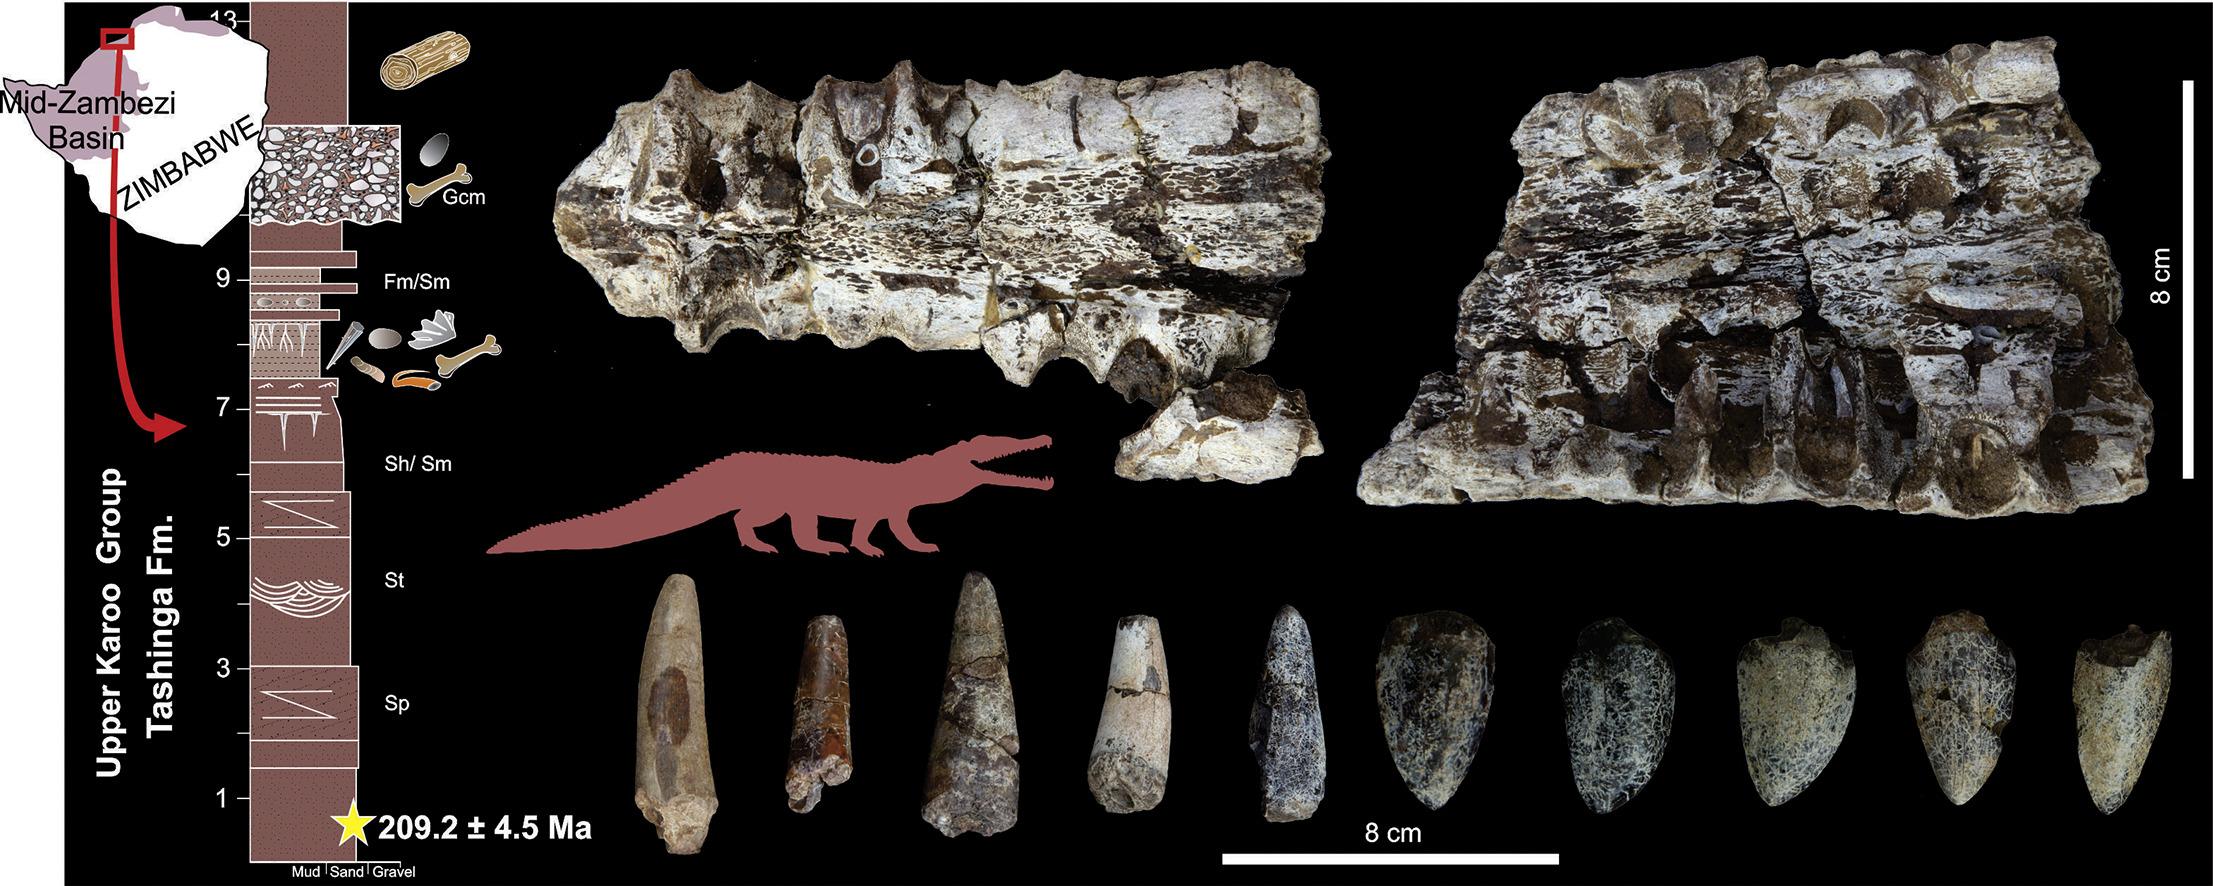 phytoszaurusz-fossziliak_paul_m_barrett_tarsai.jpg